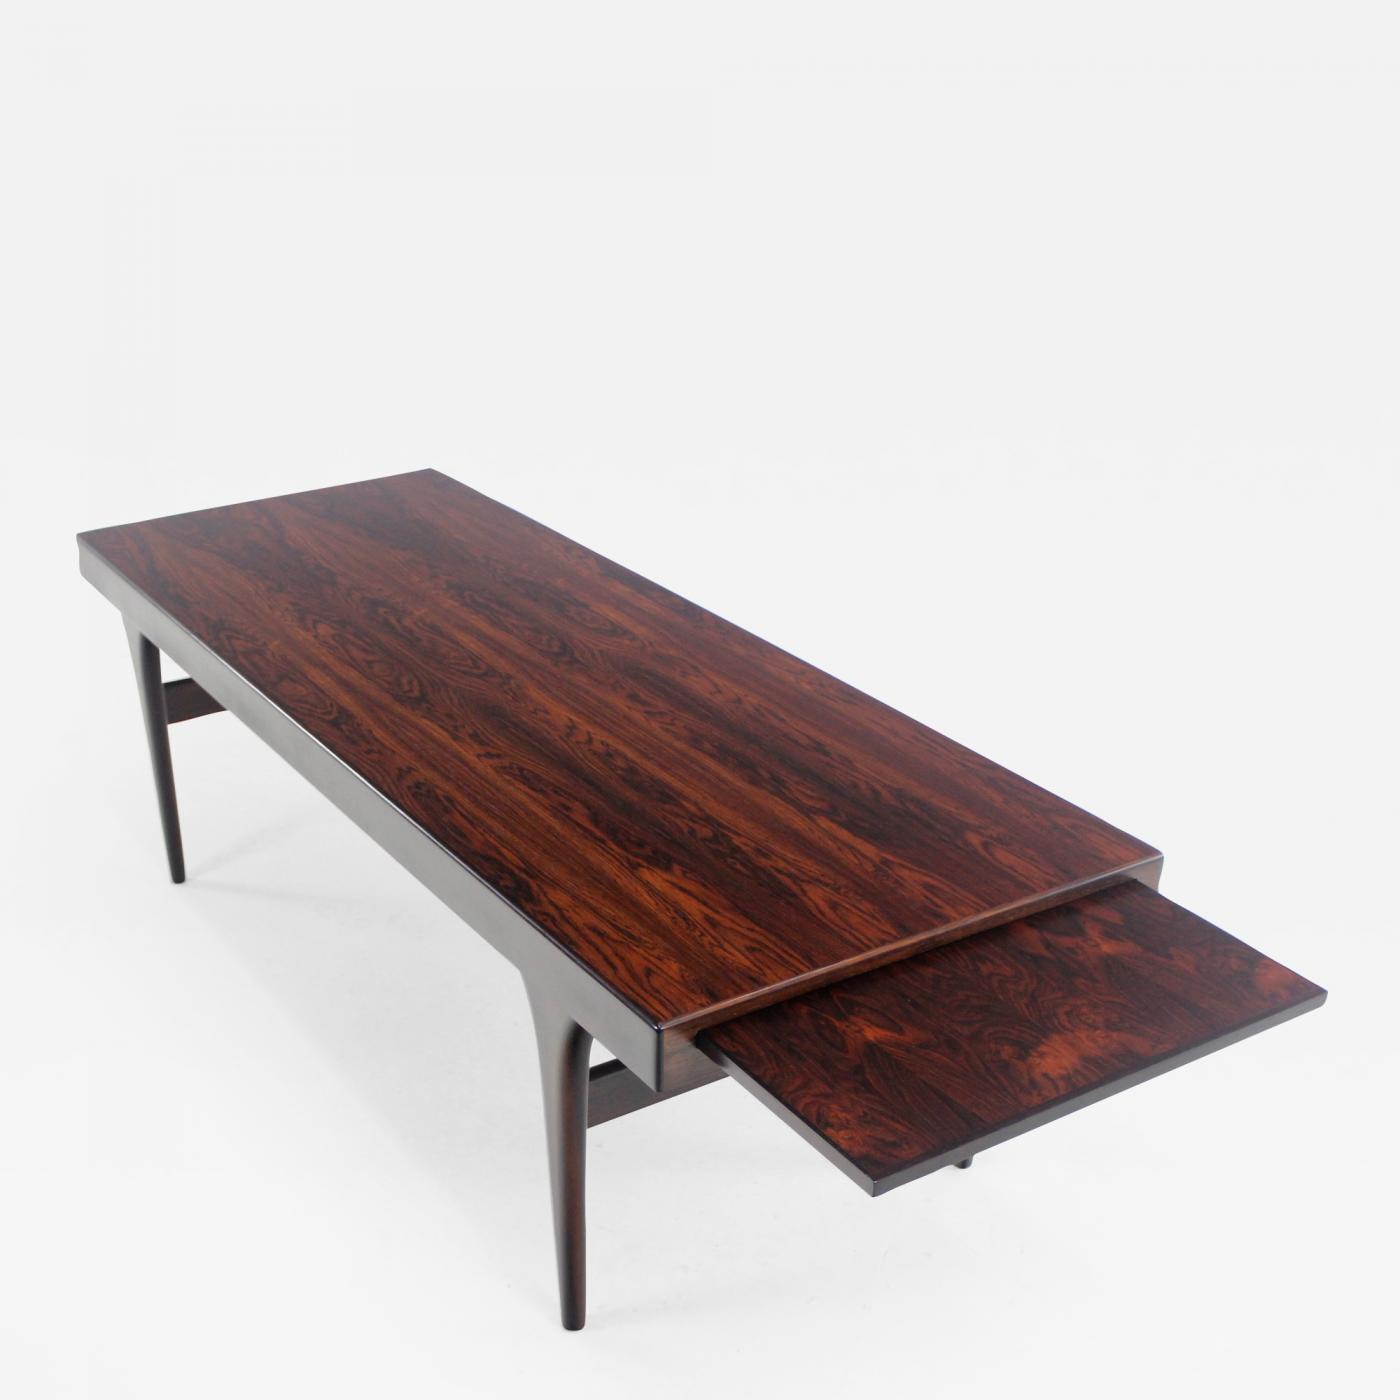 Versatile Scandinavian Modern Rosewood Coffee Table By Johannes Andersen